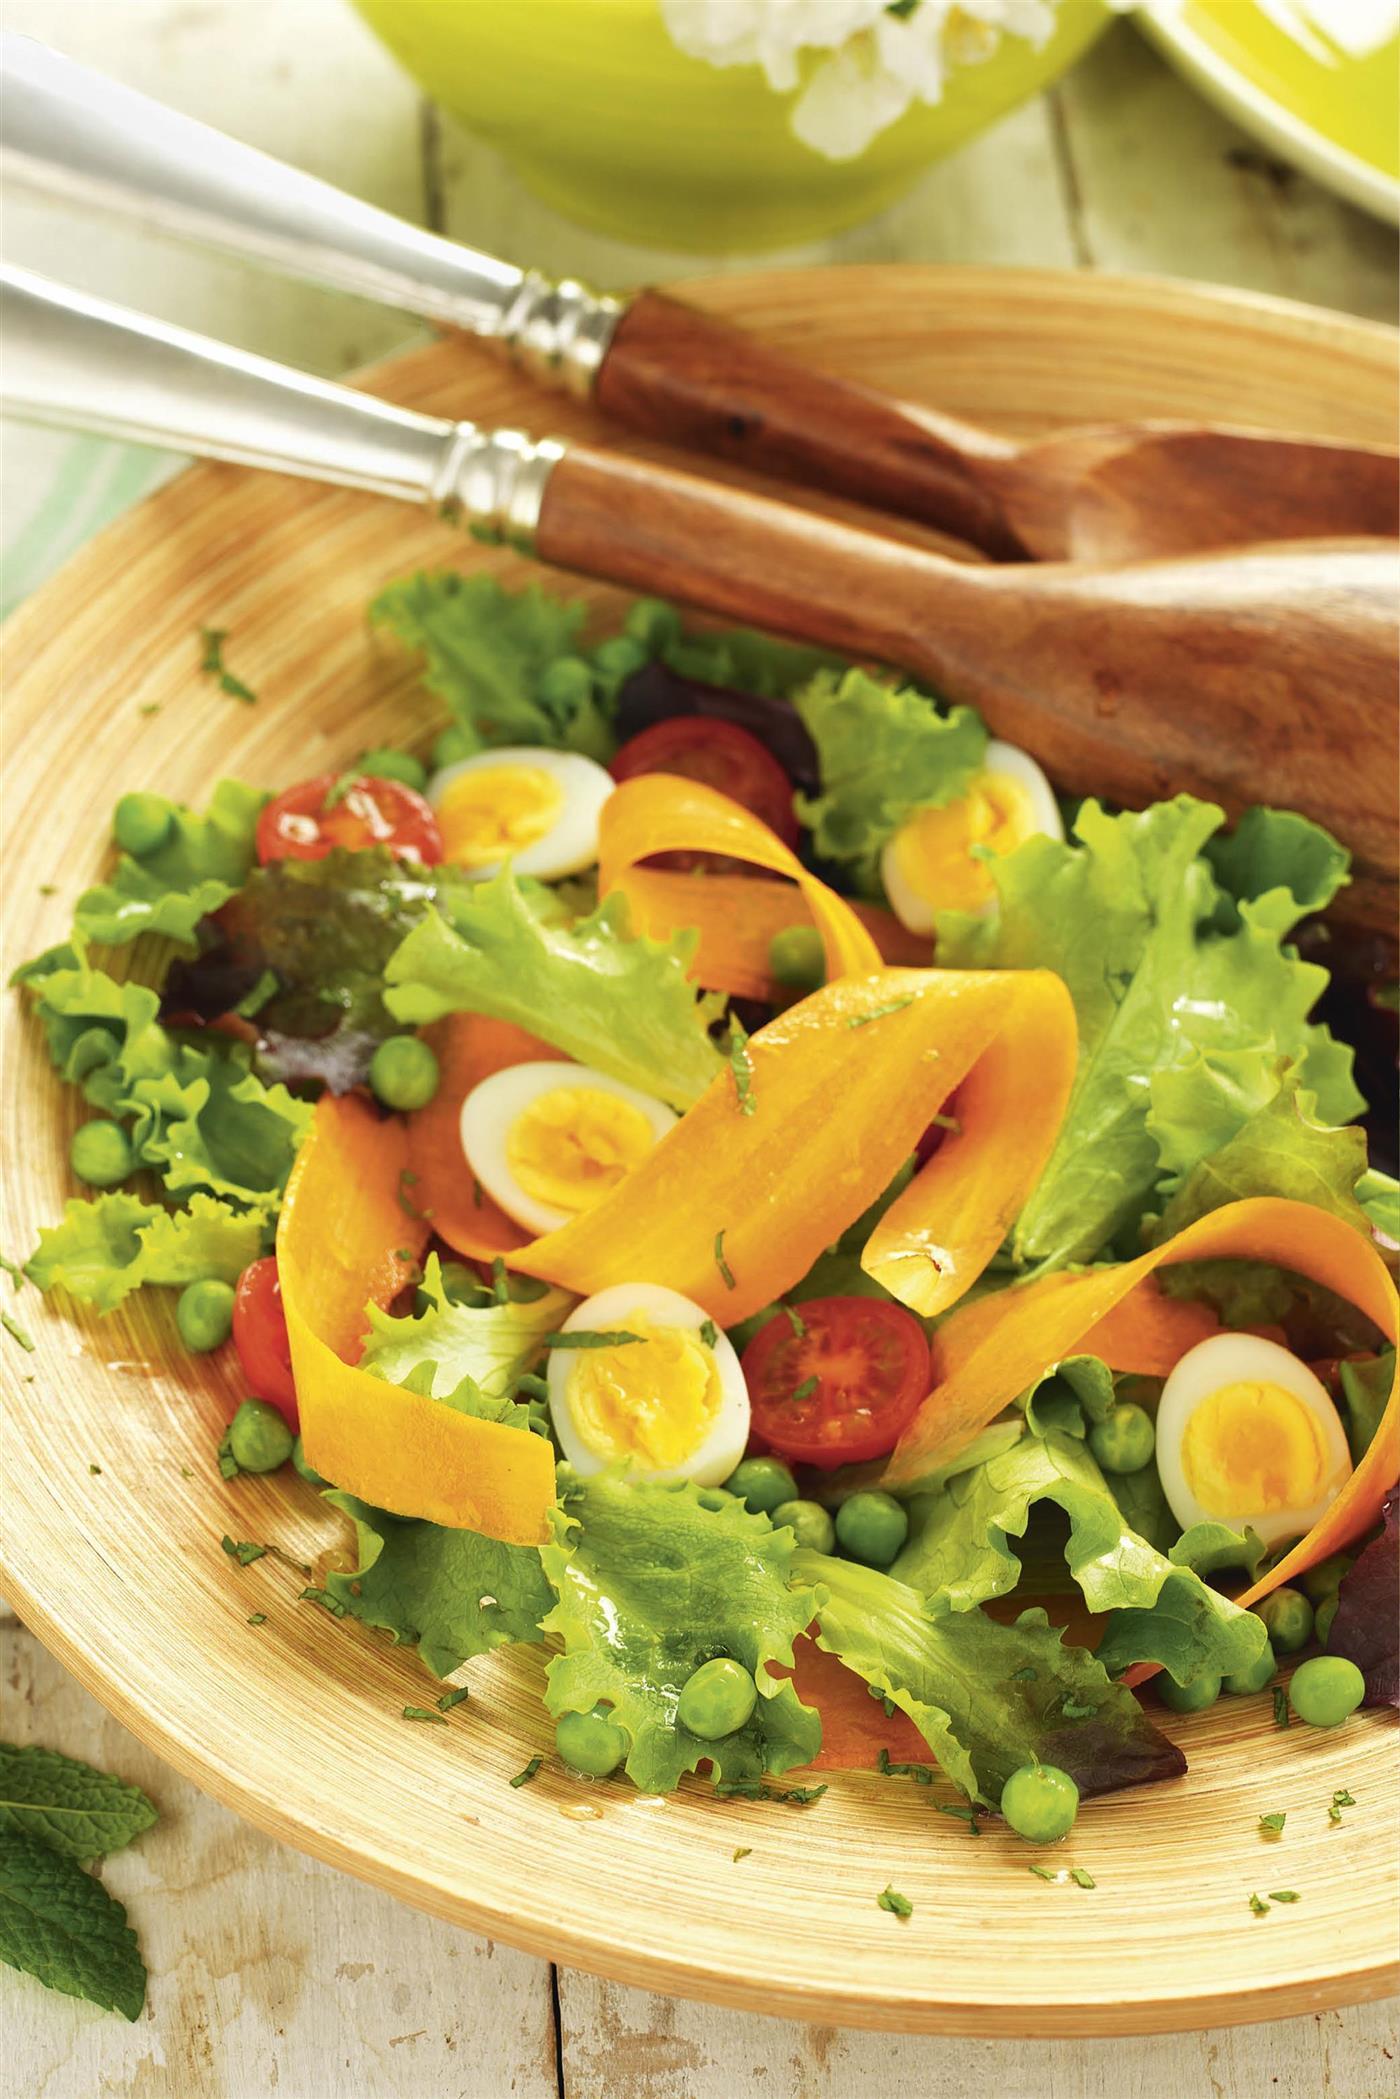 como hacer ensaladas para bajar de peso rapido